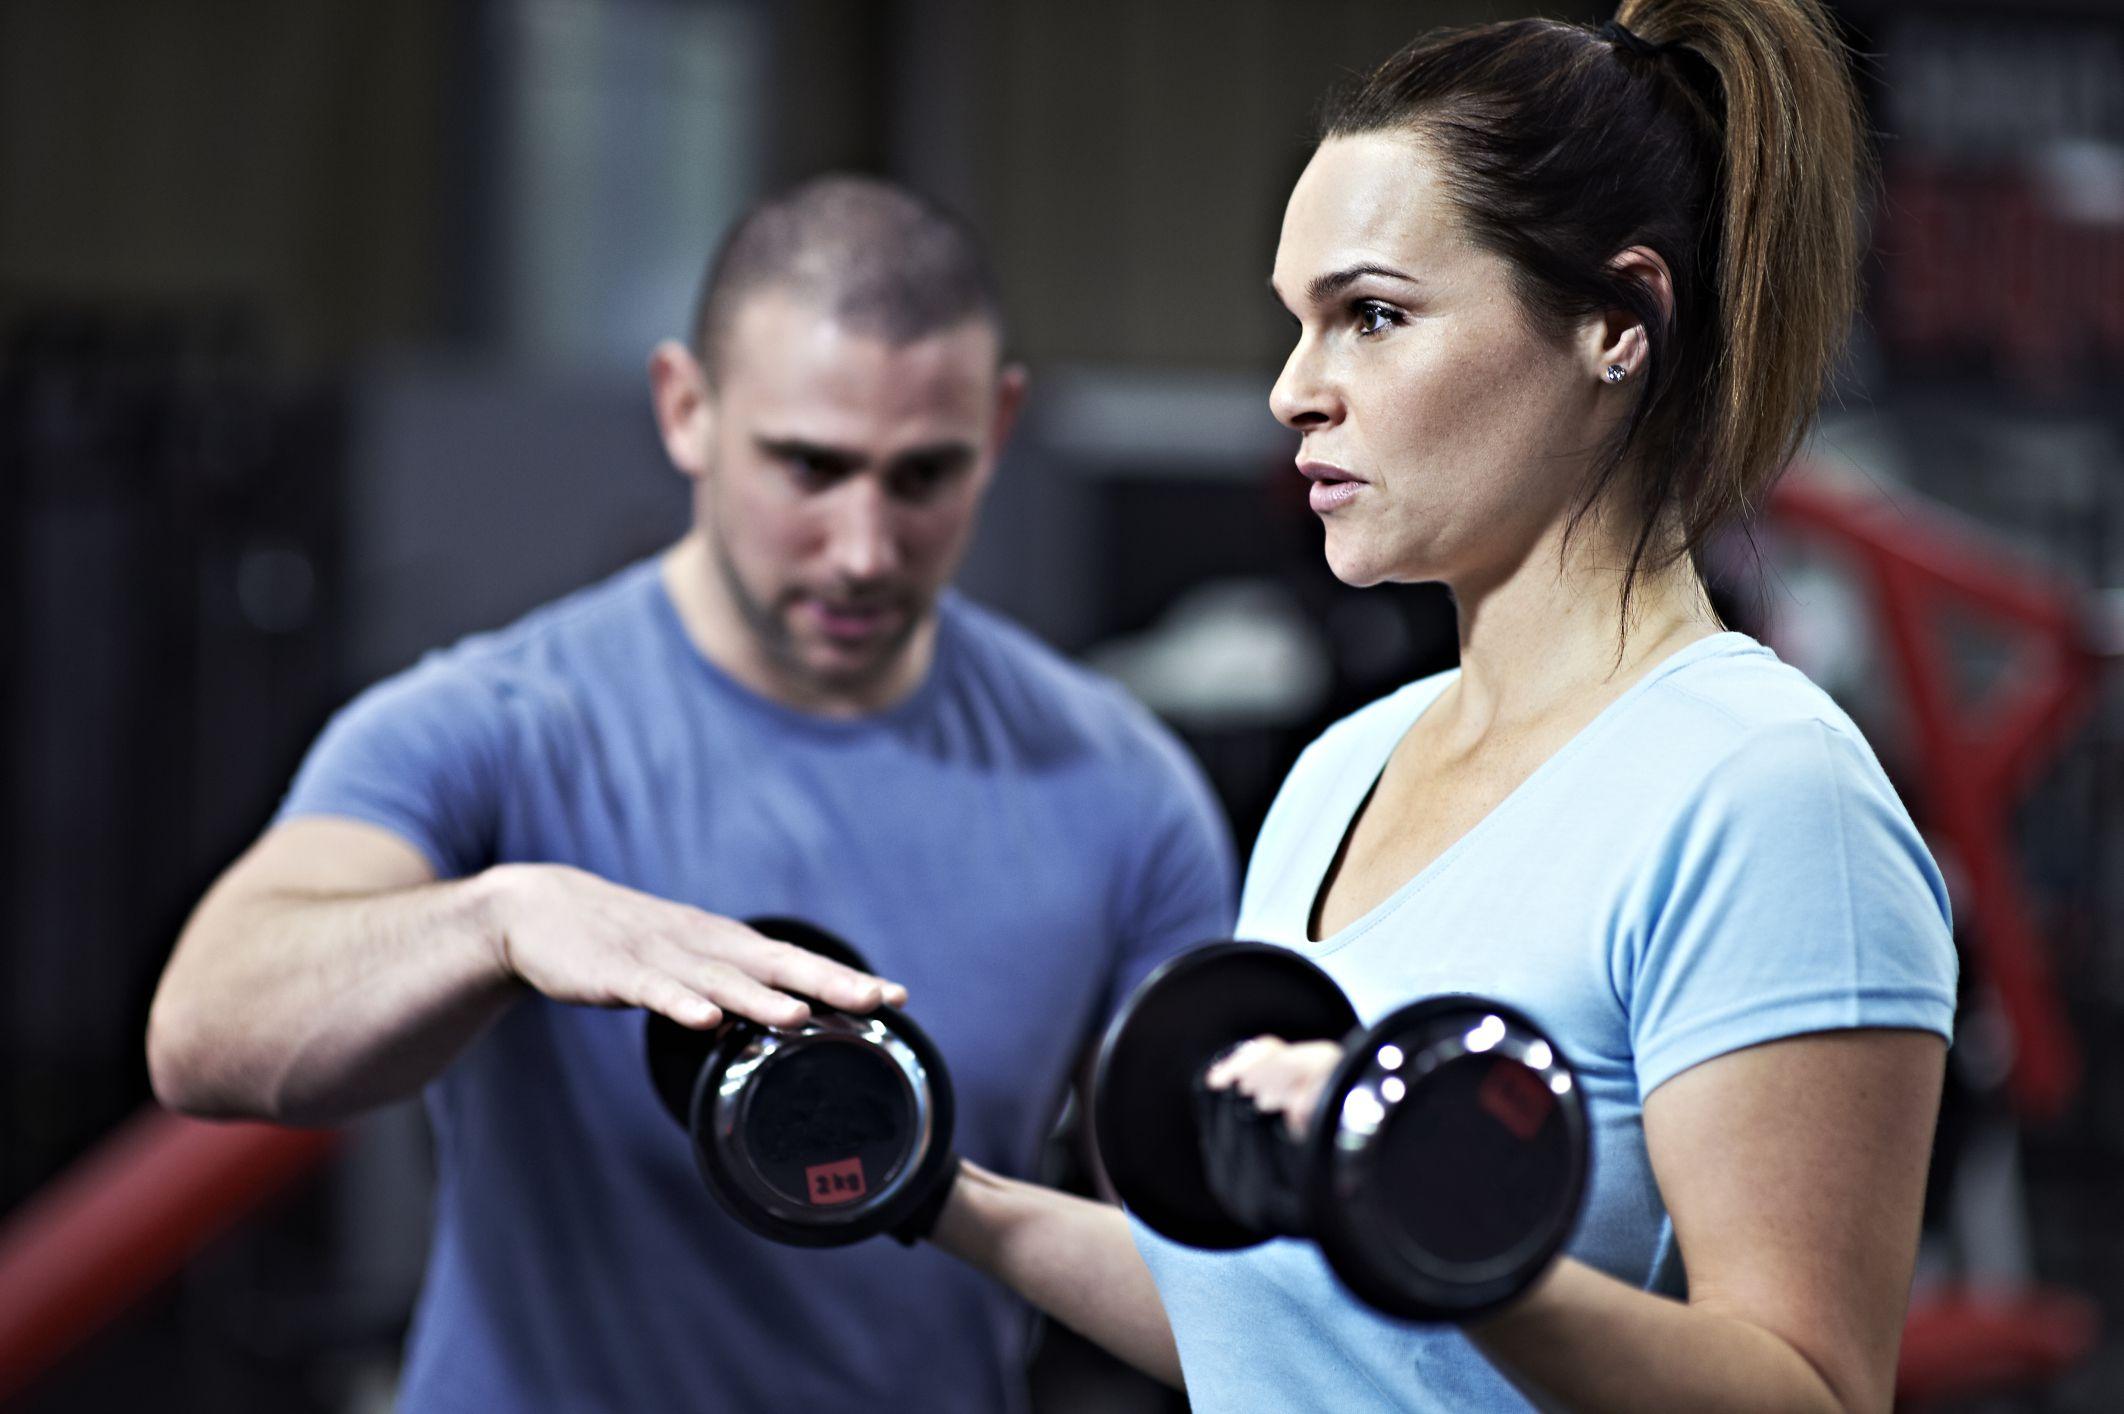 High Intensity Intervals Vs Endurance Training